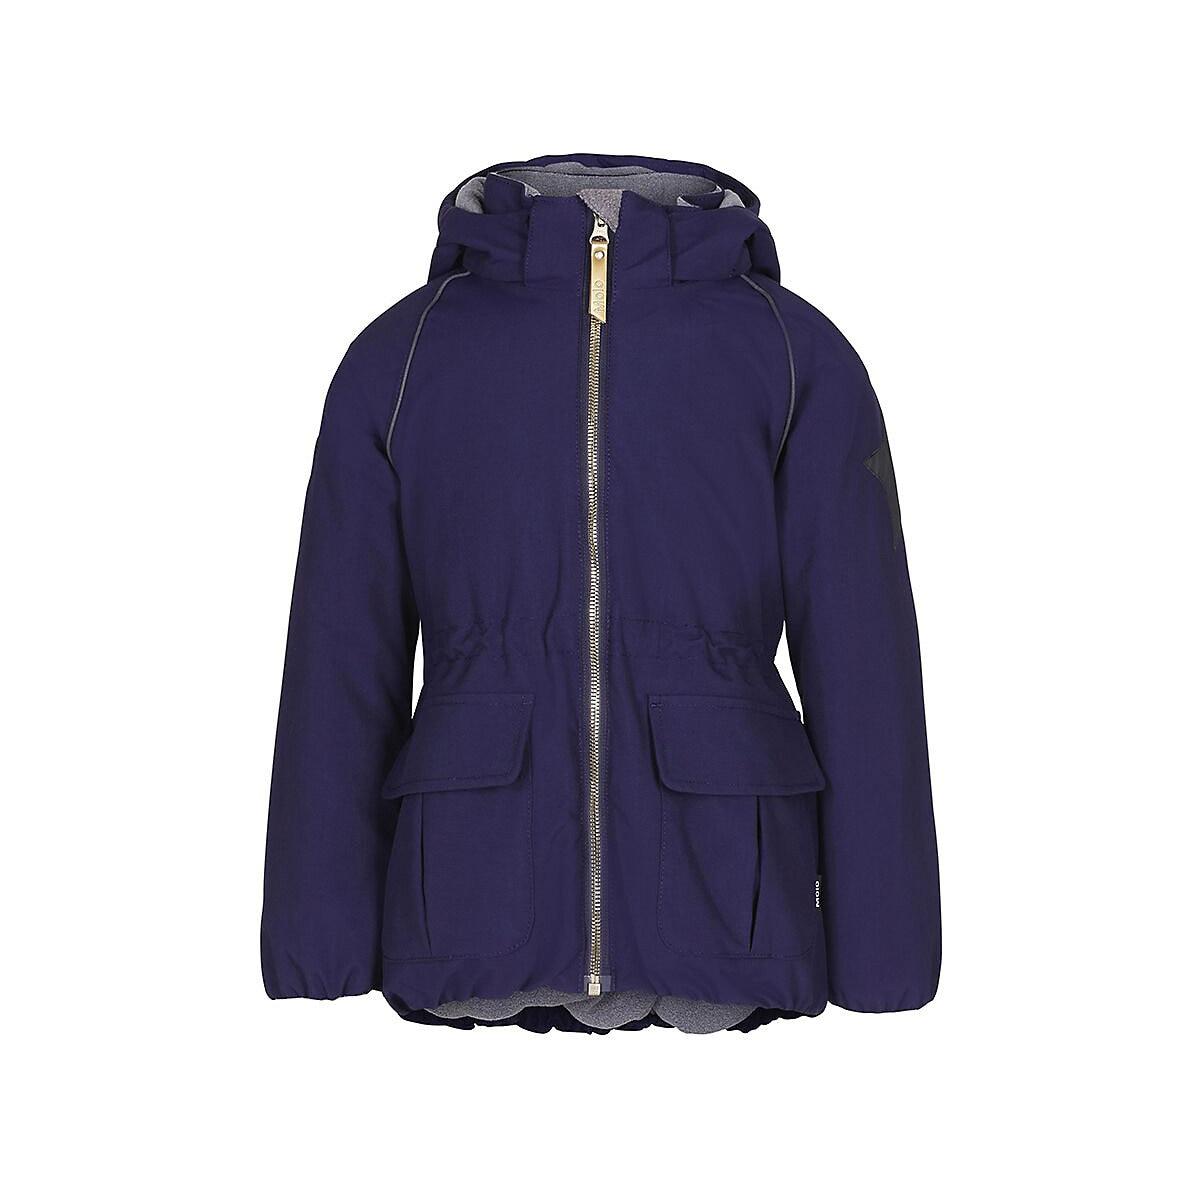 Jackets & Coats MOLO for girls 9170680 Jacket Coat Denim Cardigan Warm Children clothes Kids MTpromo ribbed hem zip up denim jacket